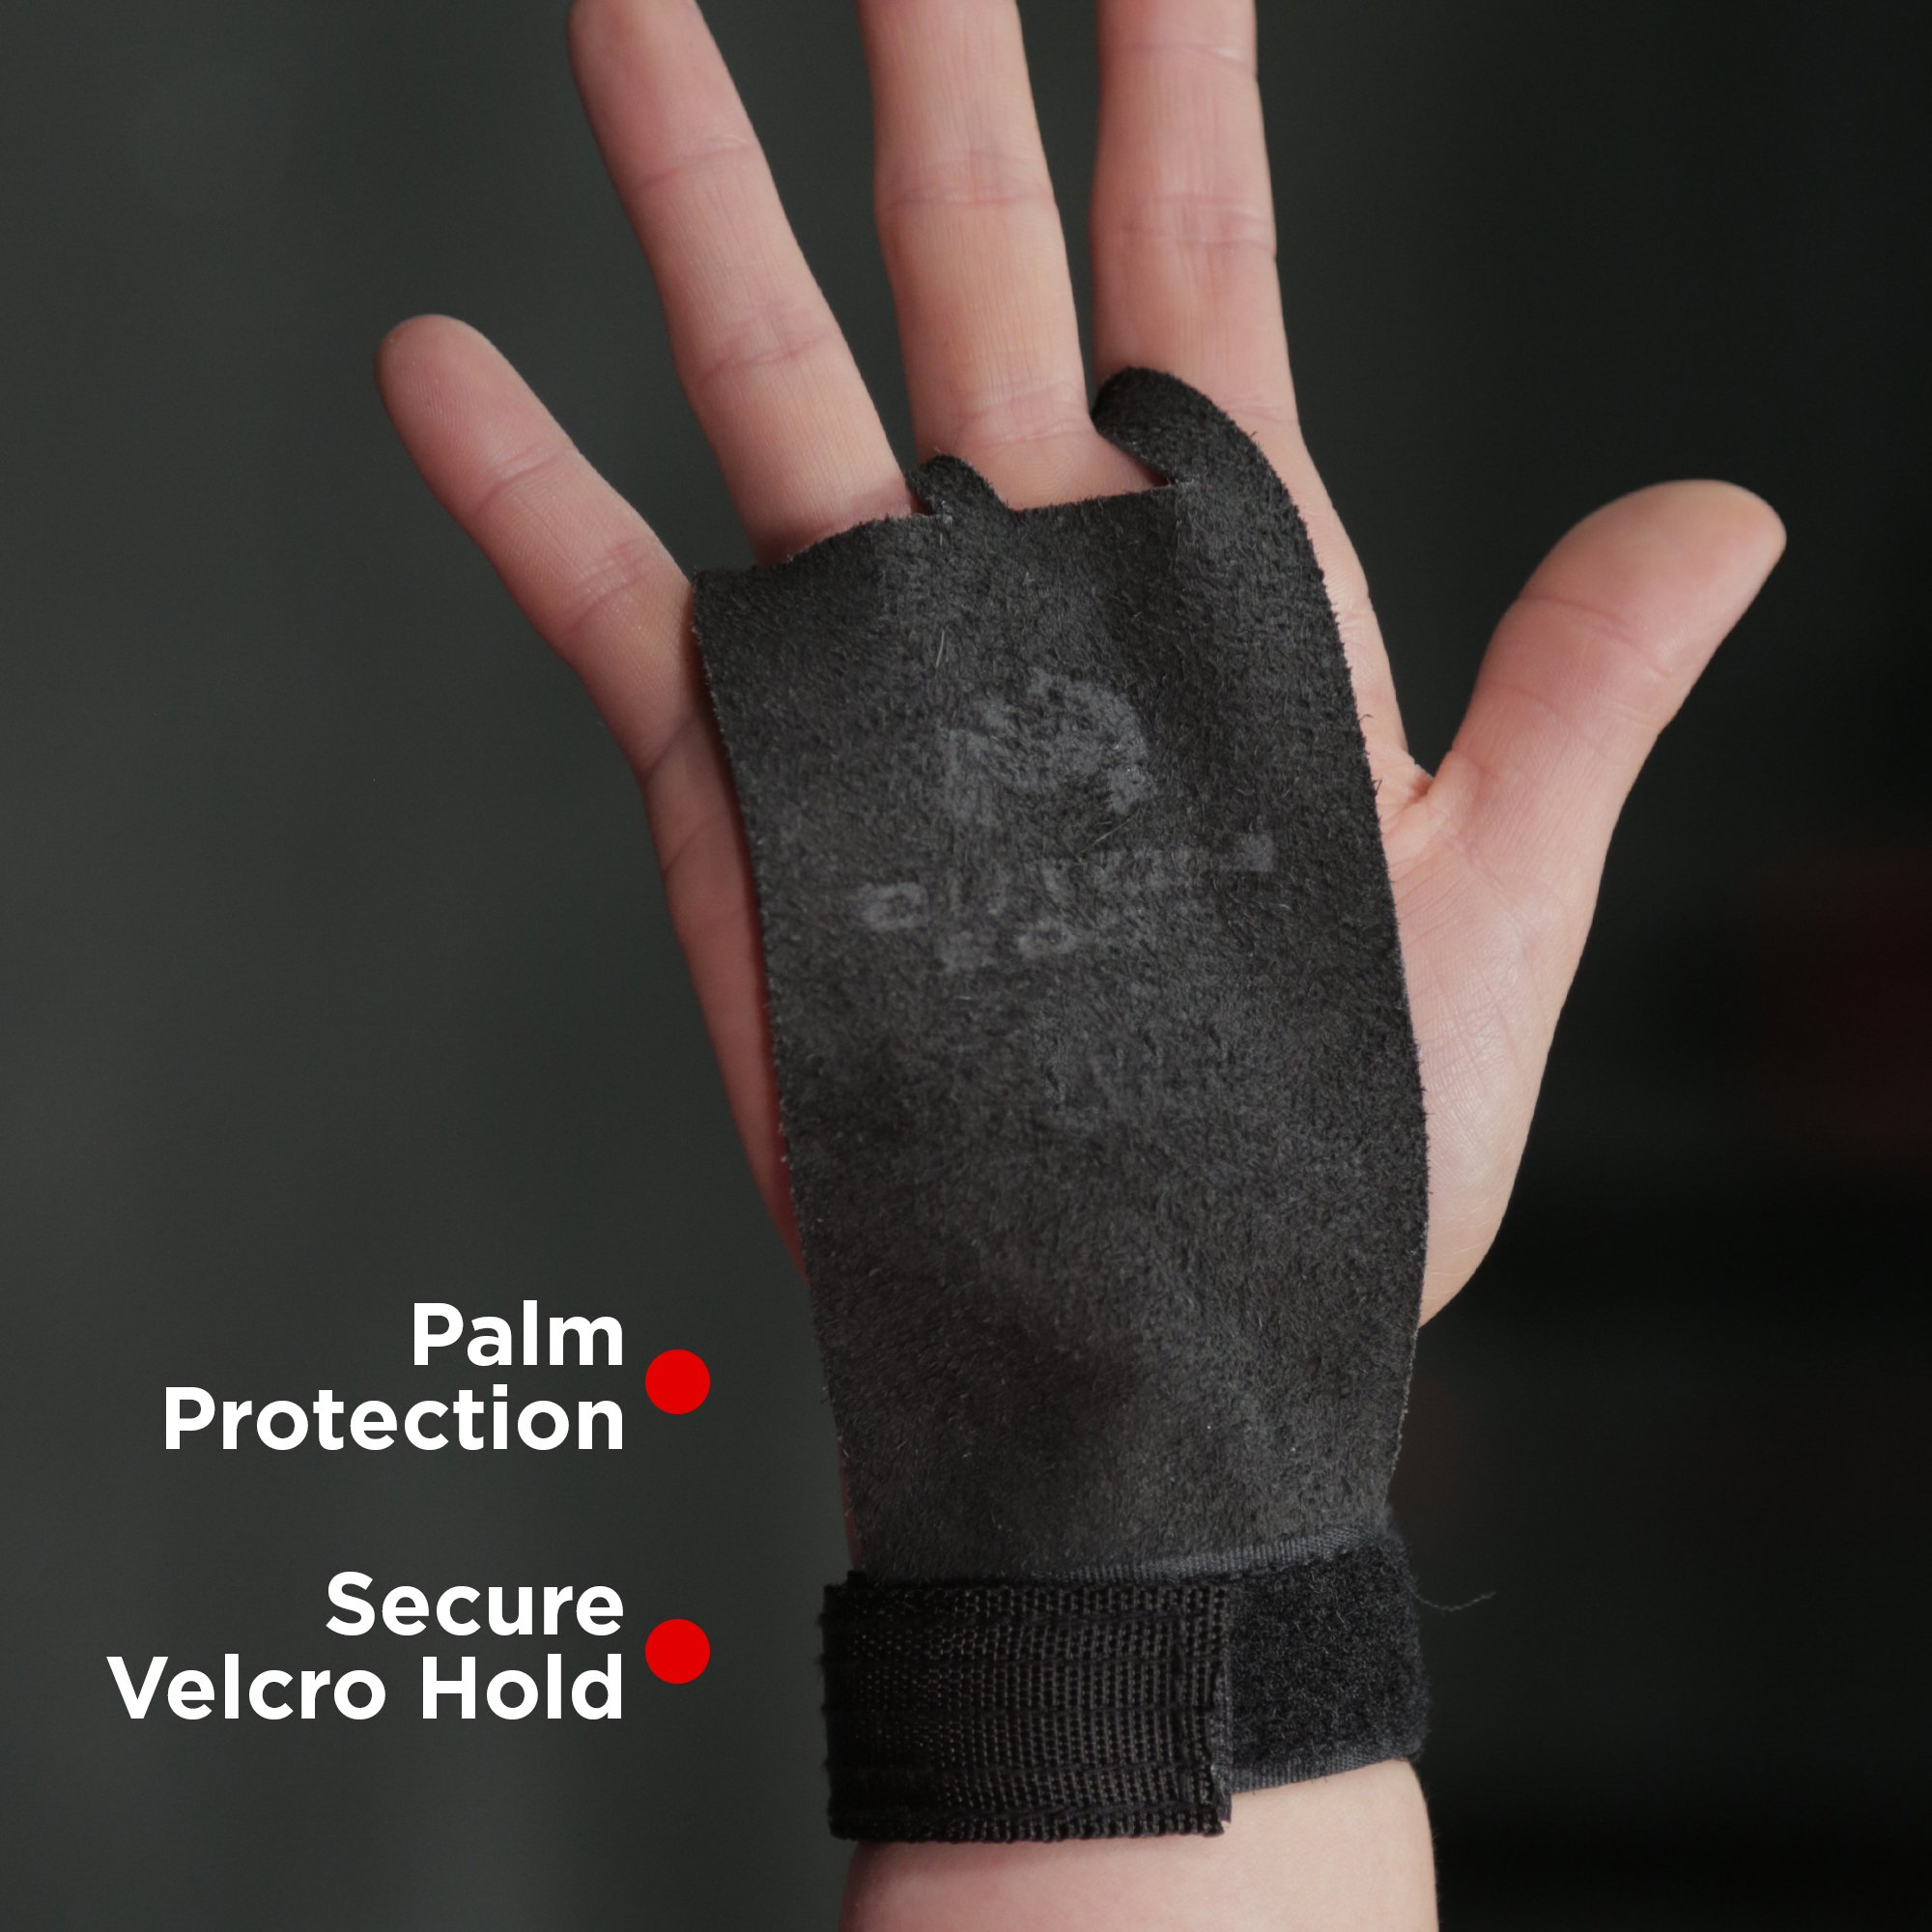 Motus Edge CrossFit Starter Kit - Palm Grips, Wrist Wraps, Speed Jump Rope - Handy Carry Bag by Motus Edge (Image #1)